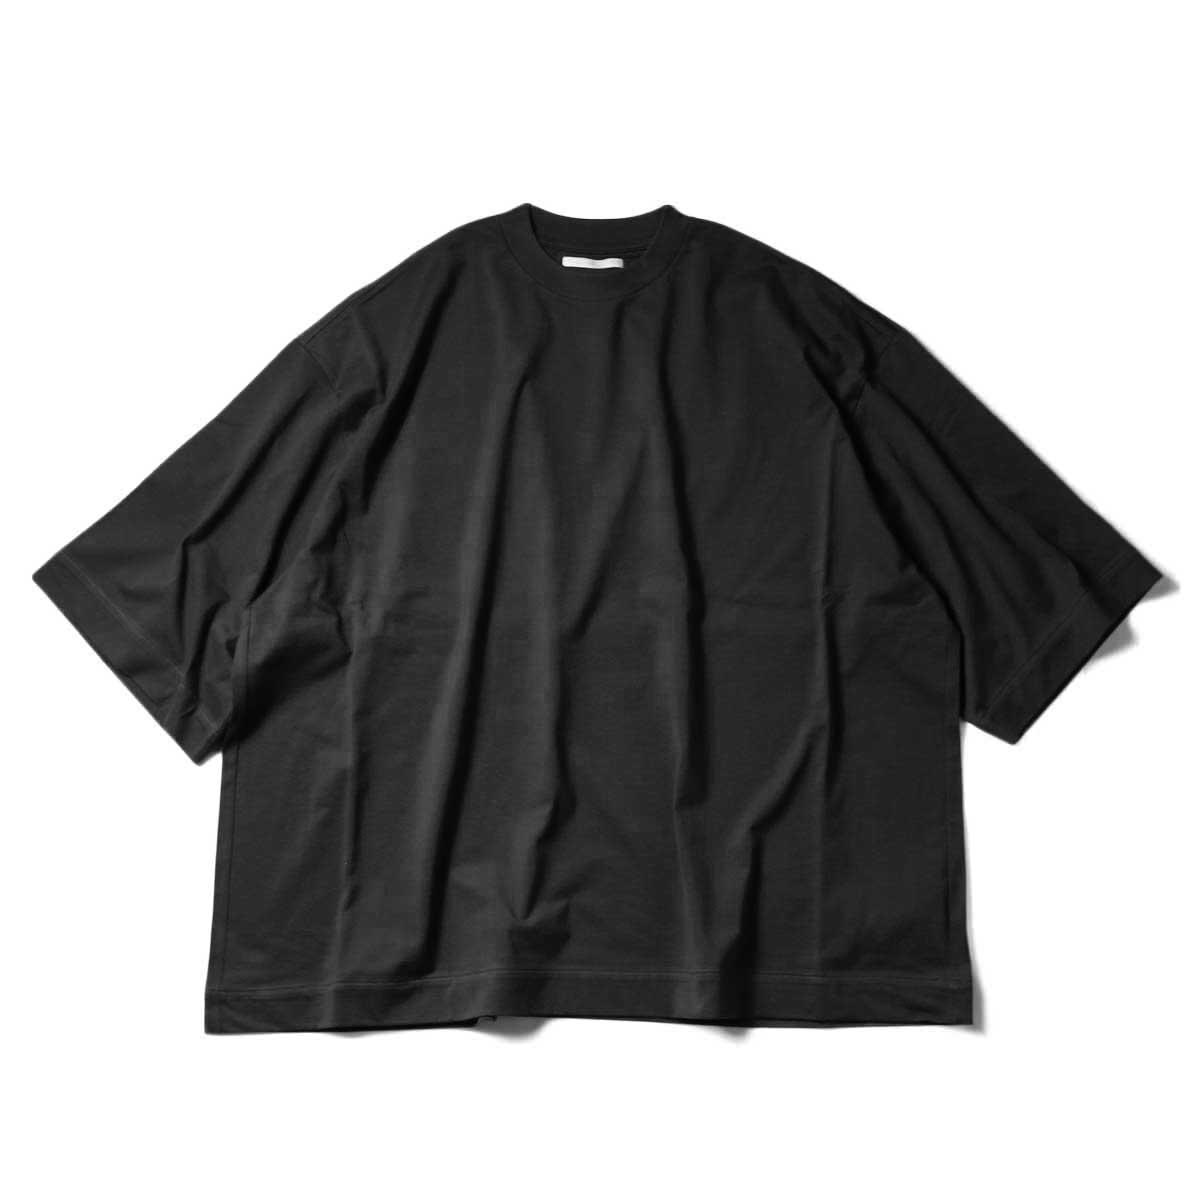 blurhms / Suvin Ripple Super Size Tee (Black)